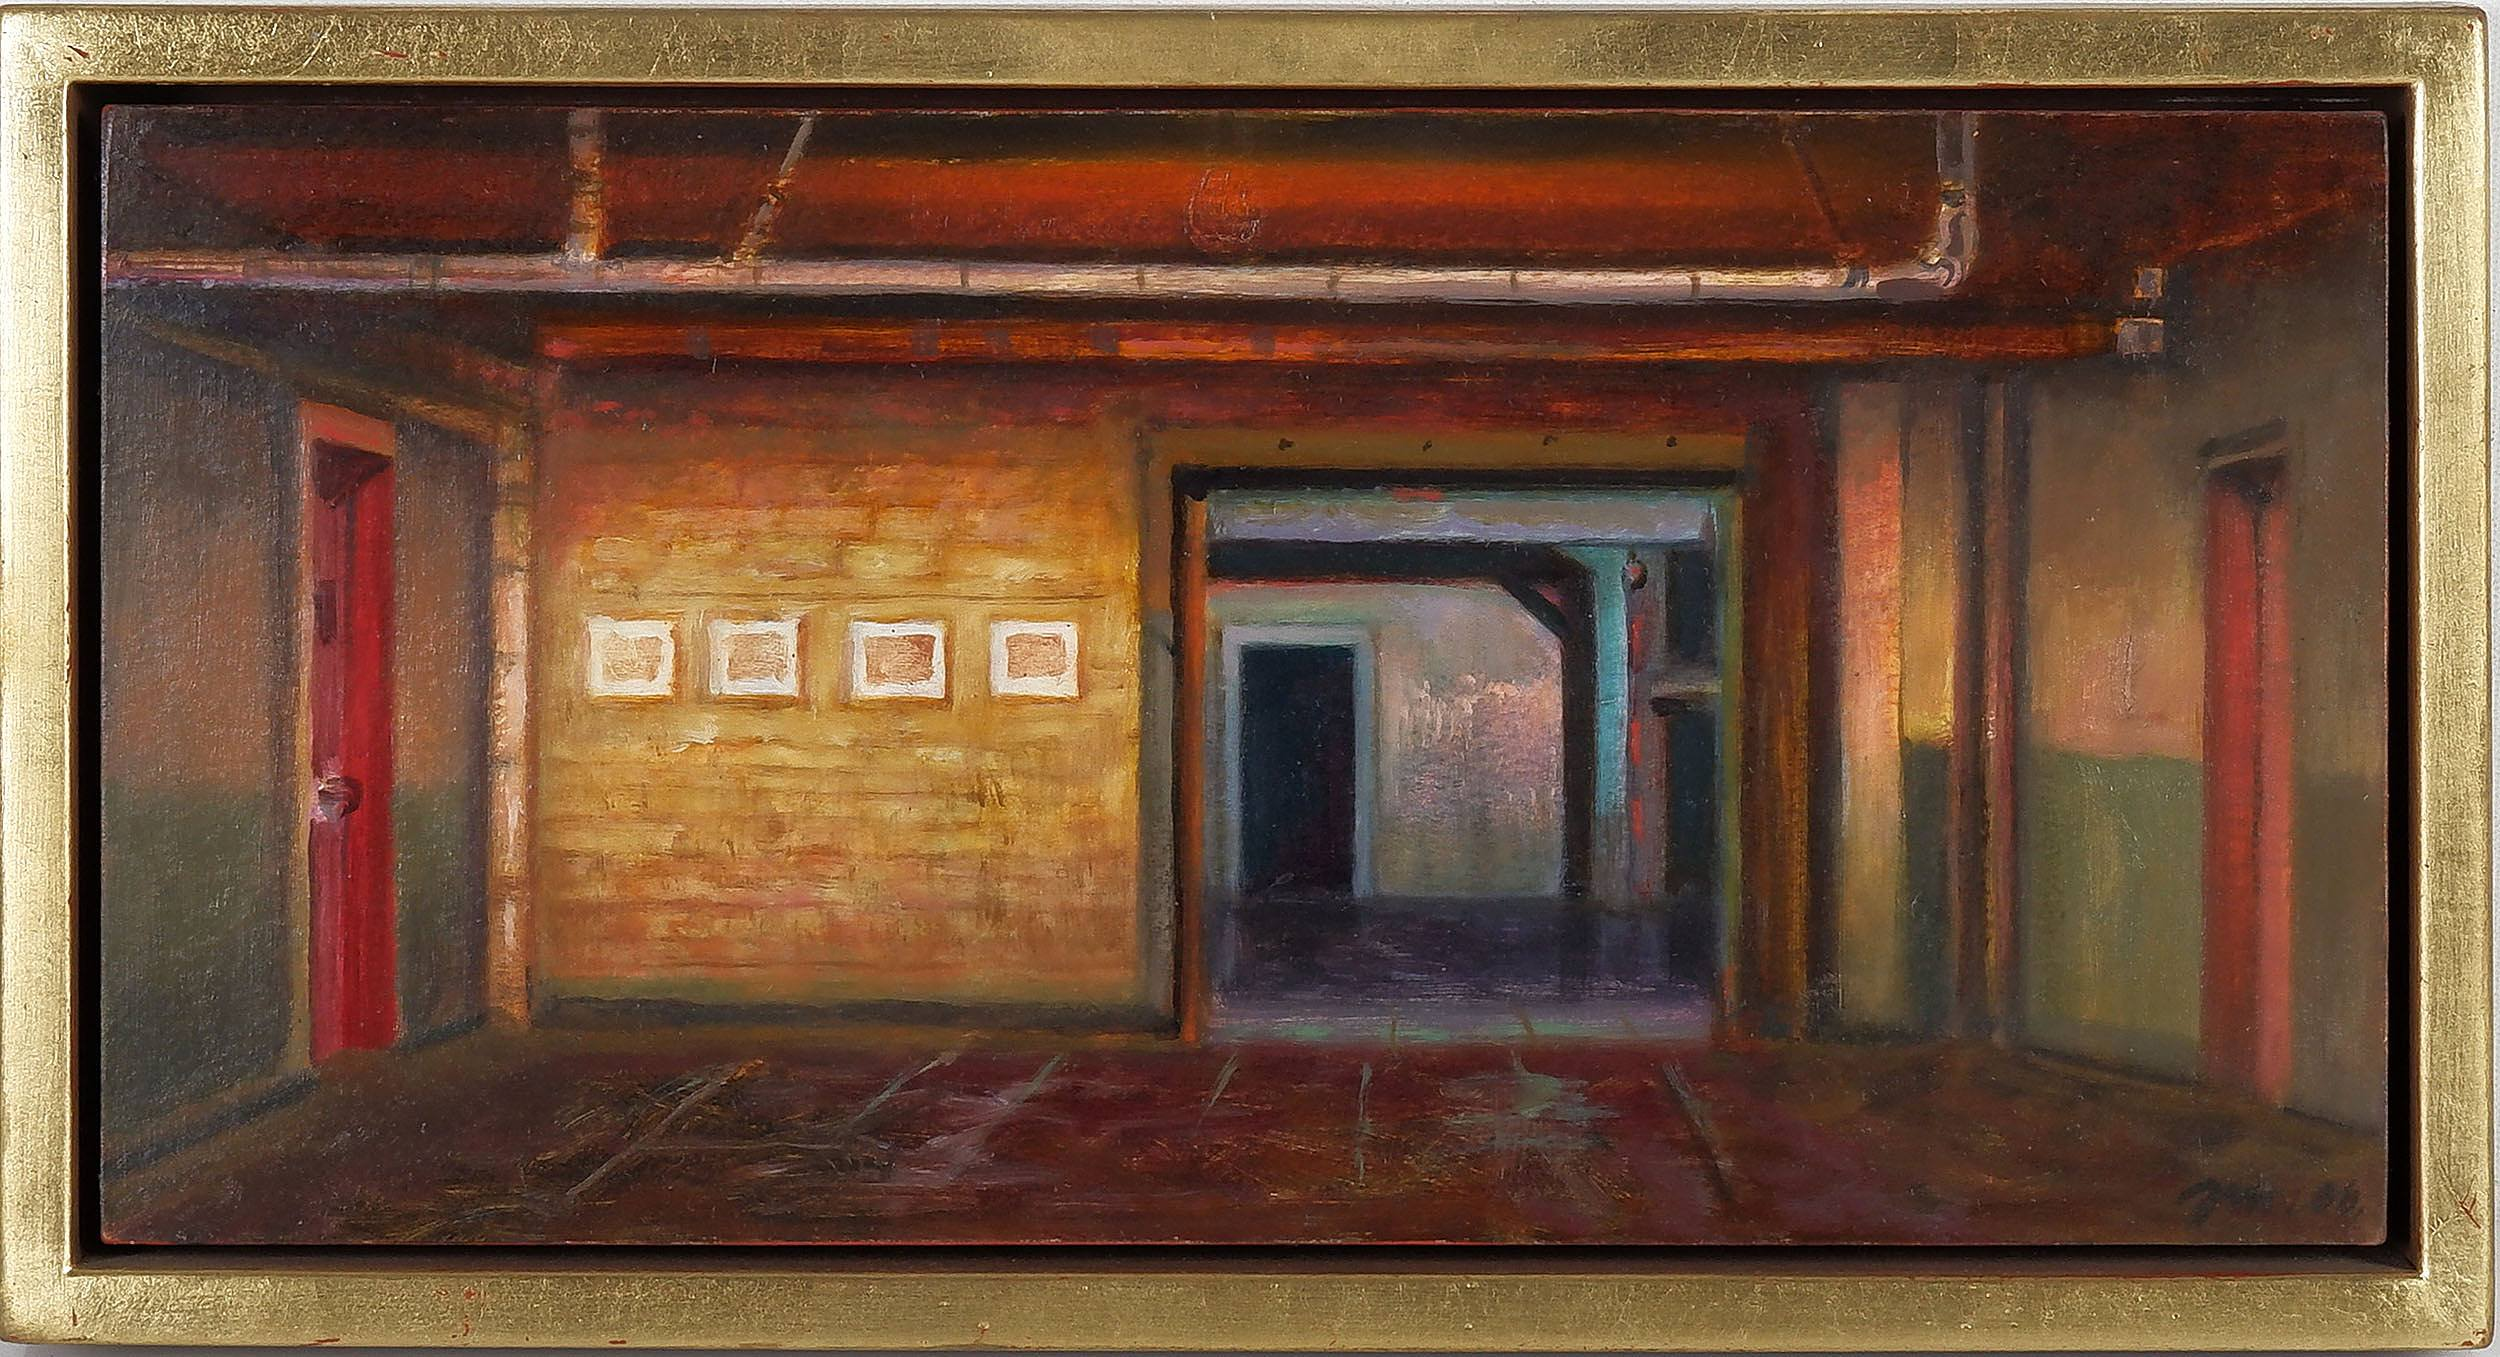 'Jerzy W. Michalski (Poland, Australia 1949-) Chelsea Interior I, Ochre on Paper'